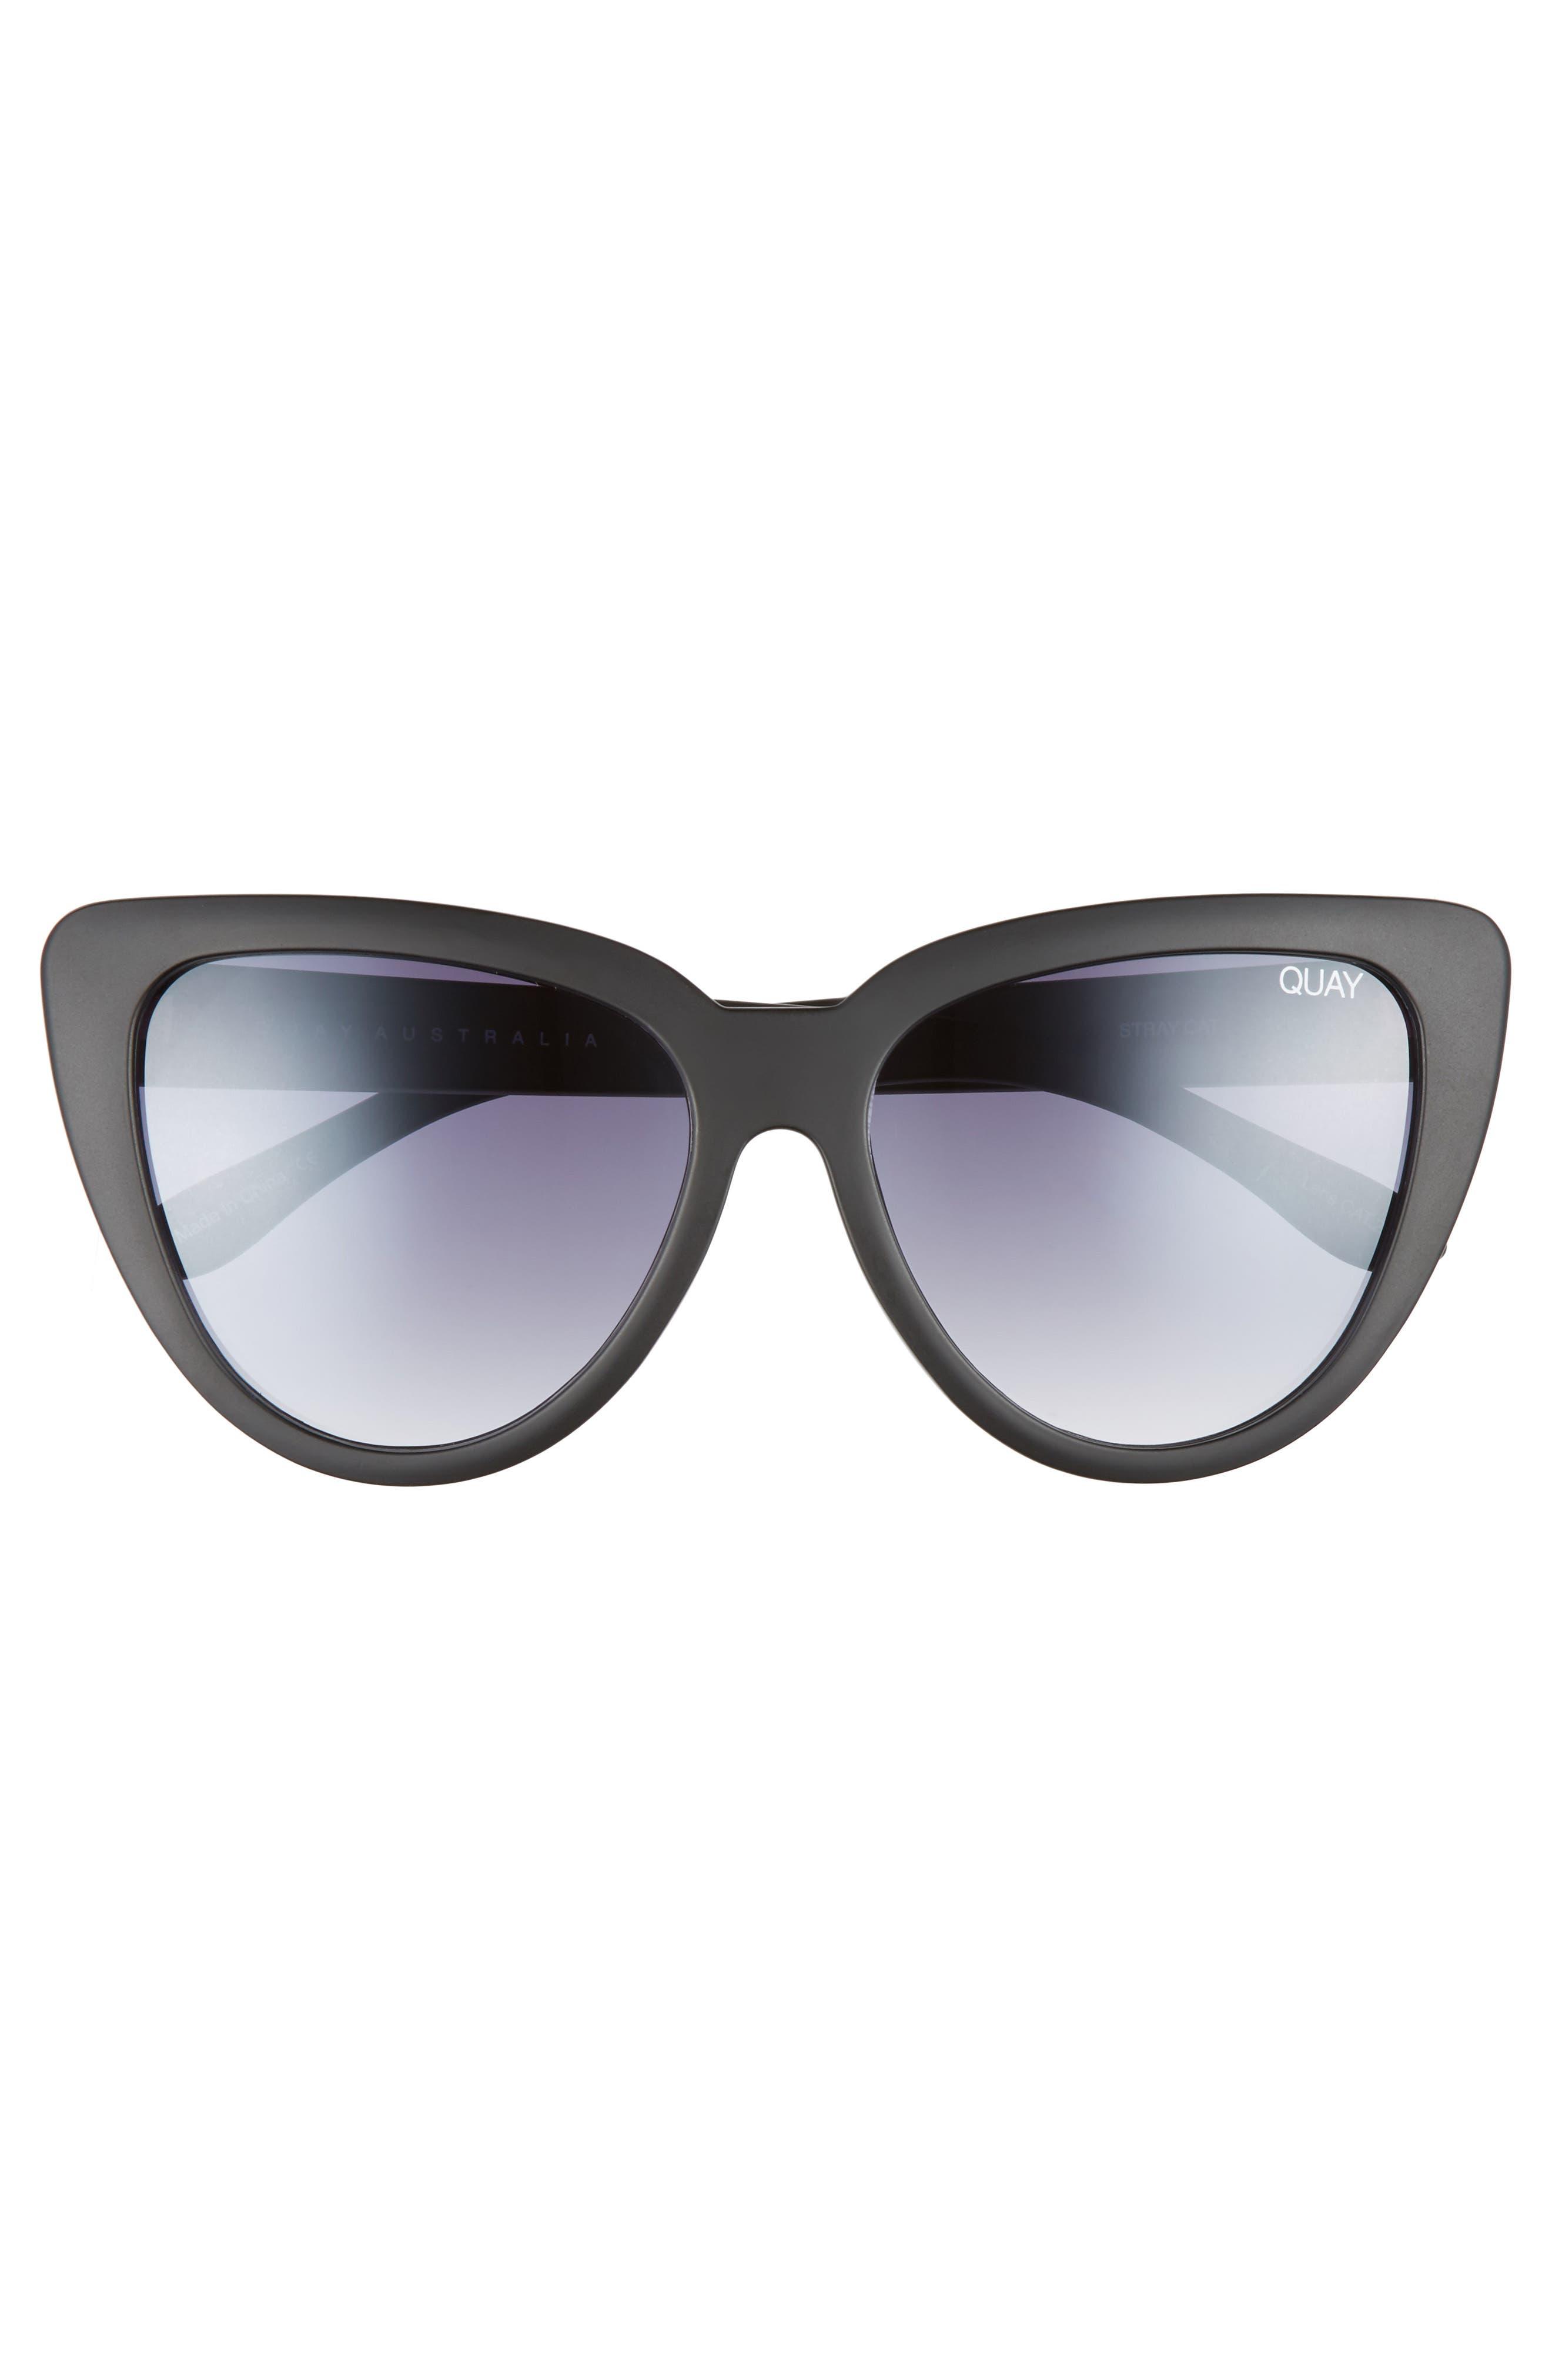 QUAY AUSTRALIA, Stray Cat 58mm Mirrored Cat Eye Sunglasses, Alternate thumbnail 3, color, 001